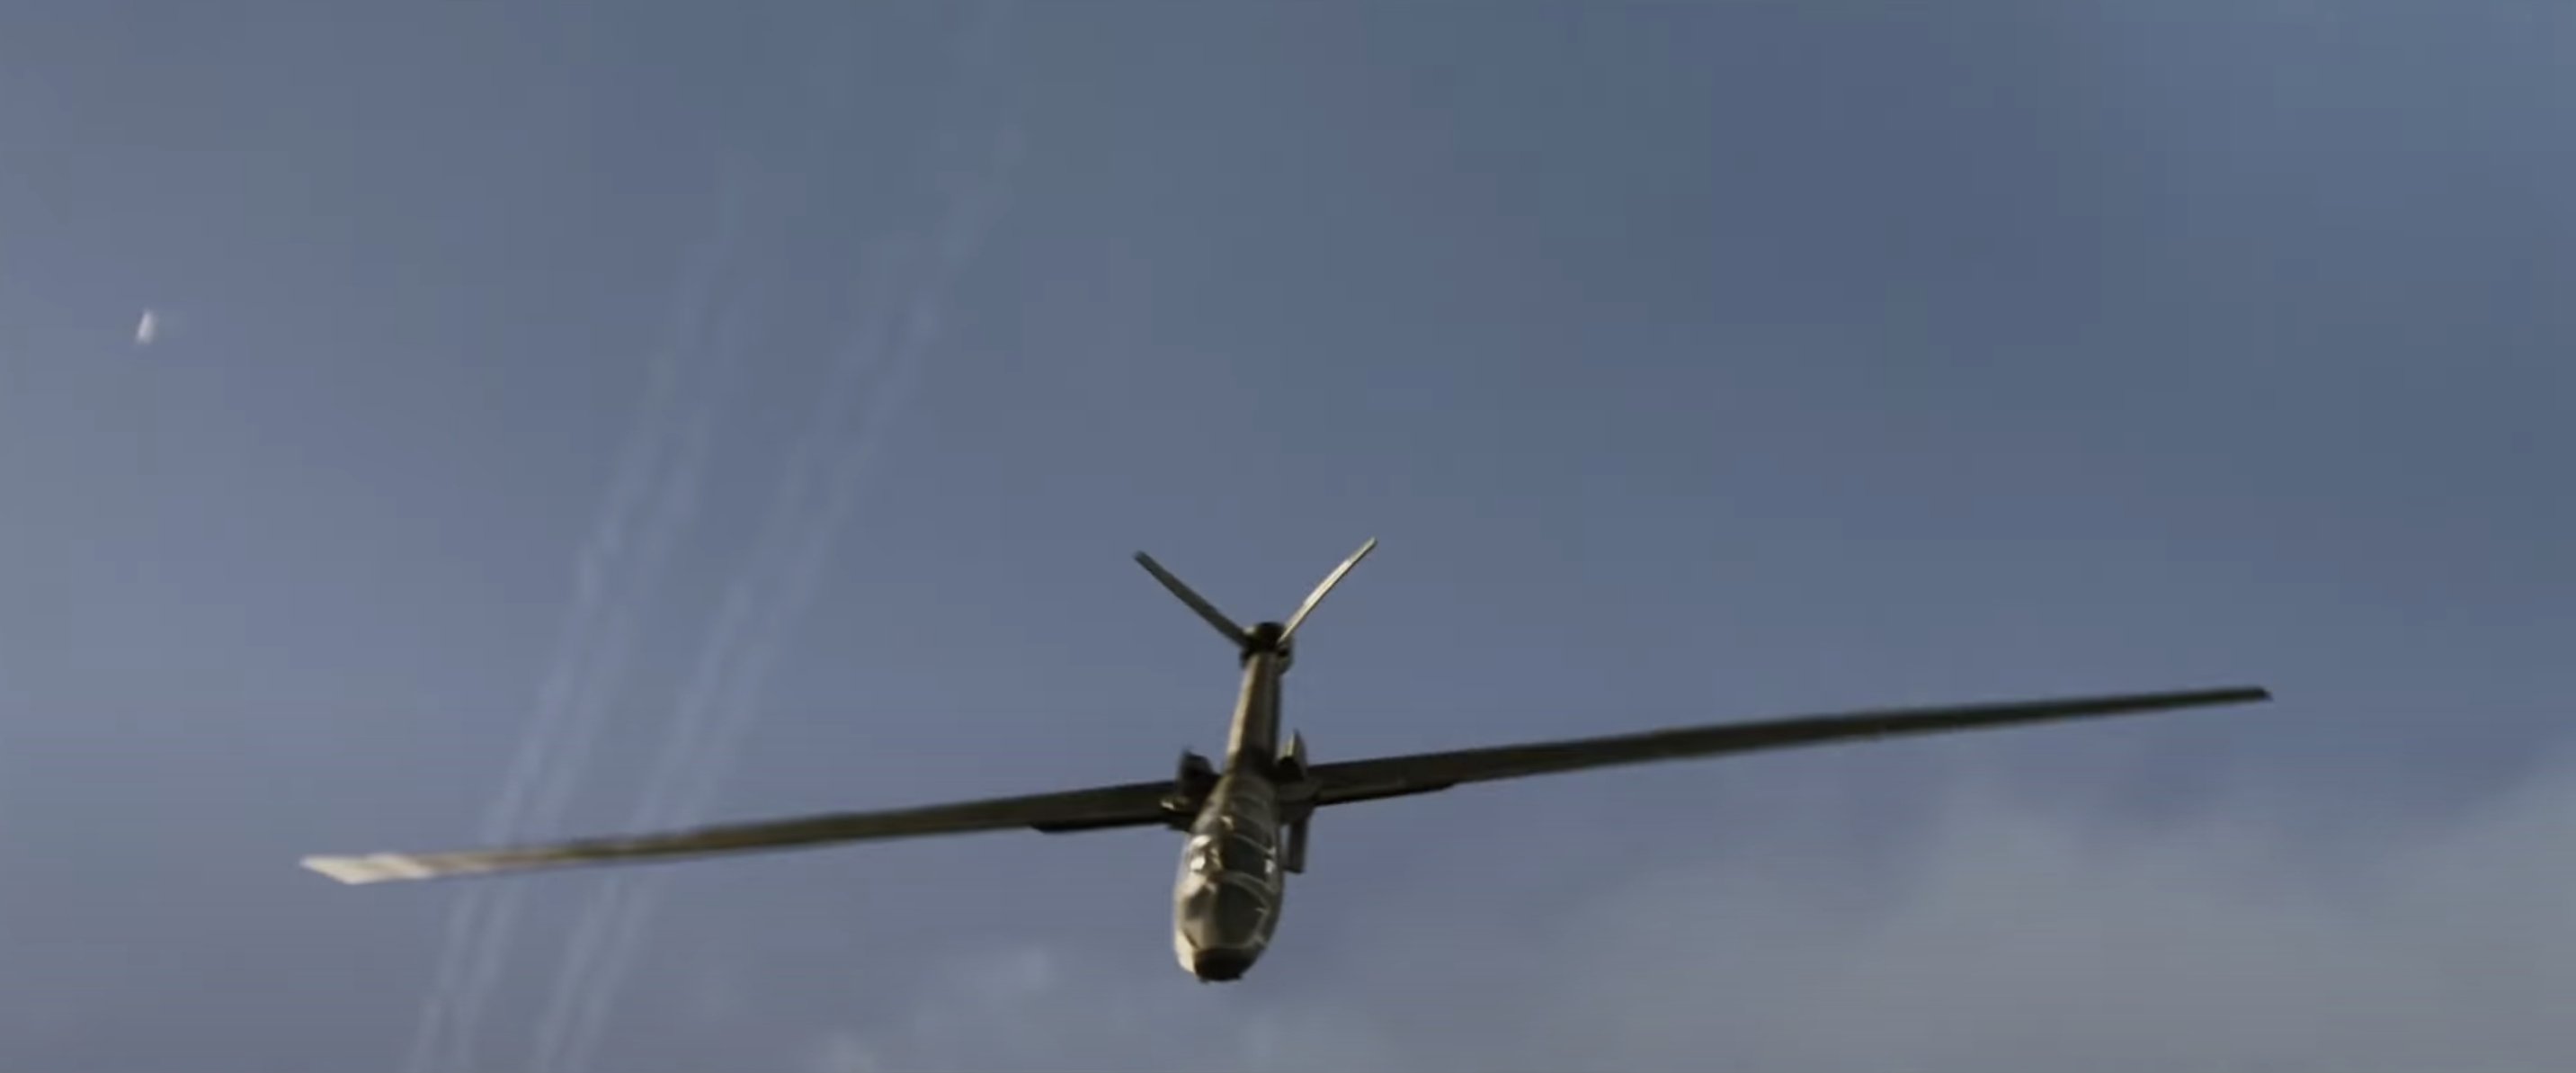 No Time to Die James Bond scissor wing plane